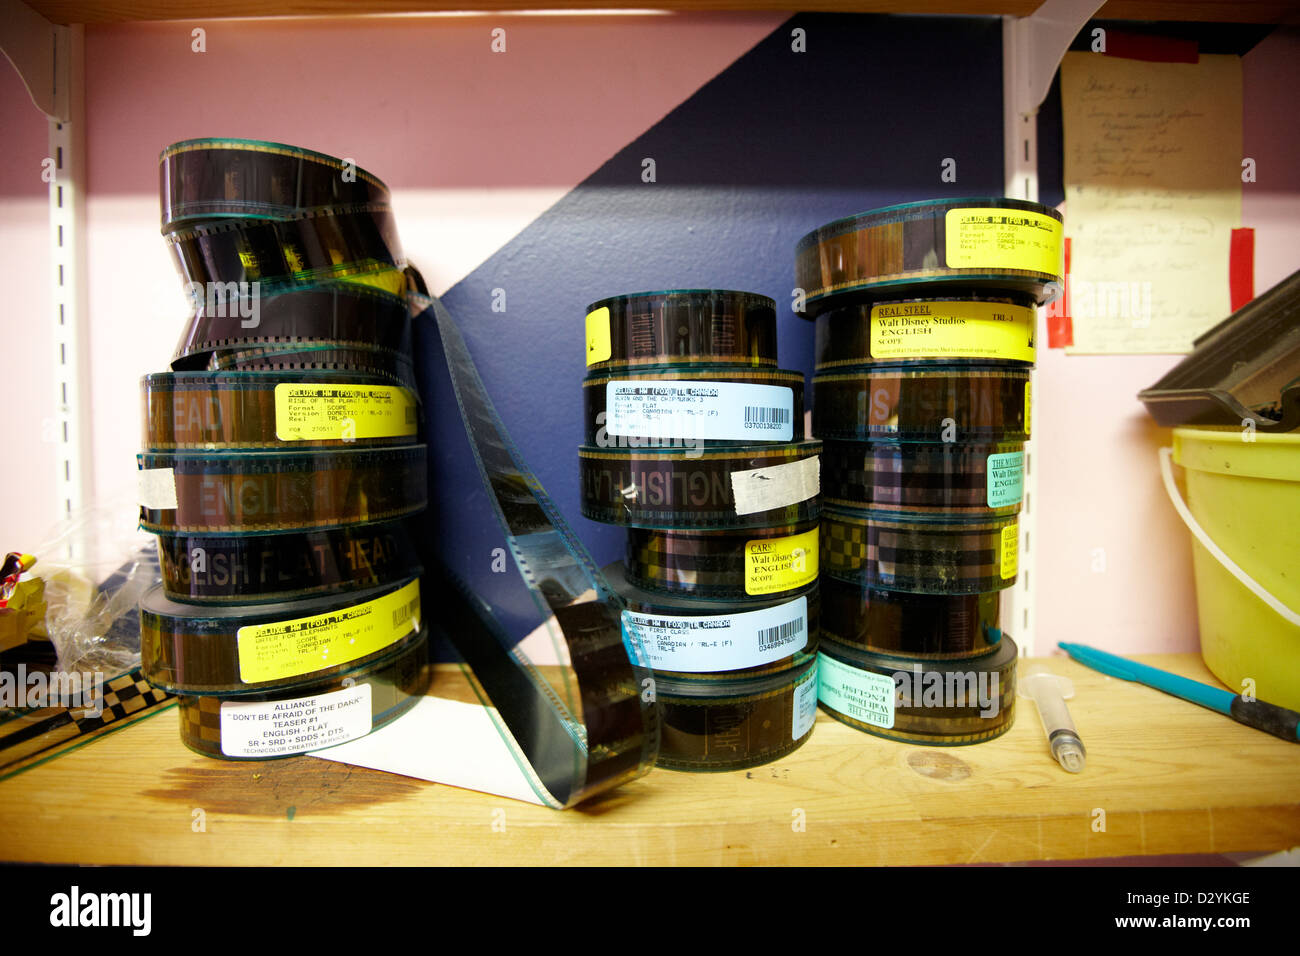 35mm-Kinofilme auf Regal im alten Kino Vorführraum Biggar Saskatchewan Kanada Stockbild